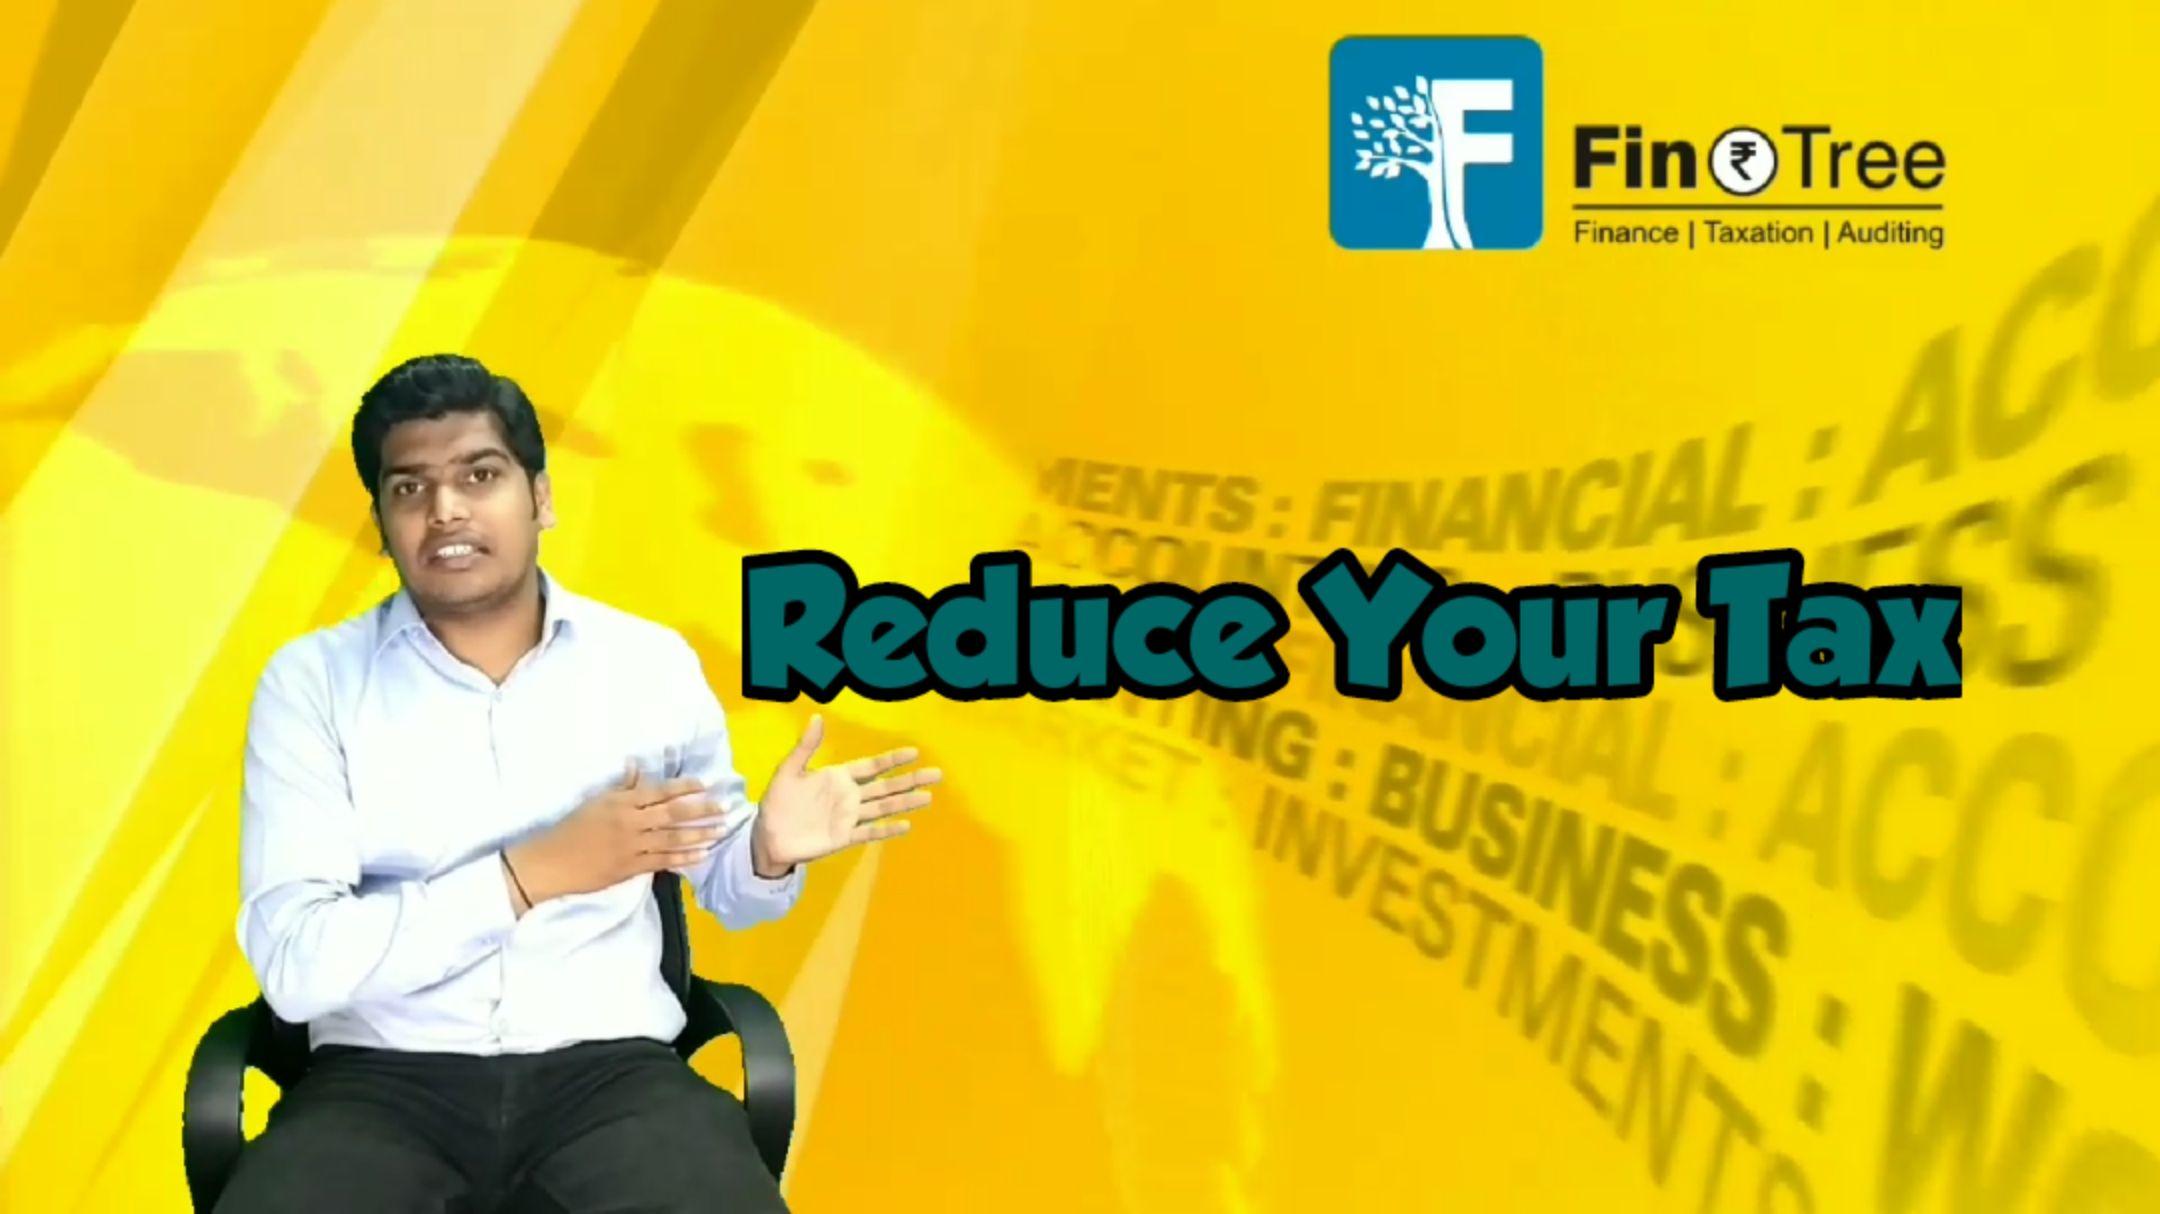 Life Insurance Benefits Taxable